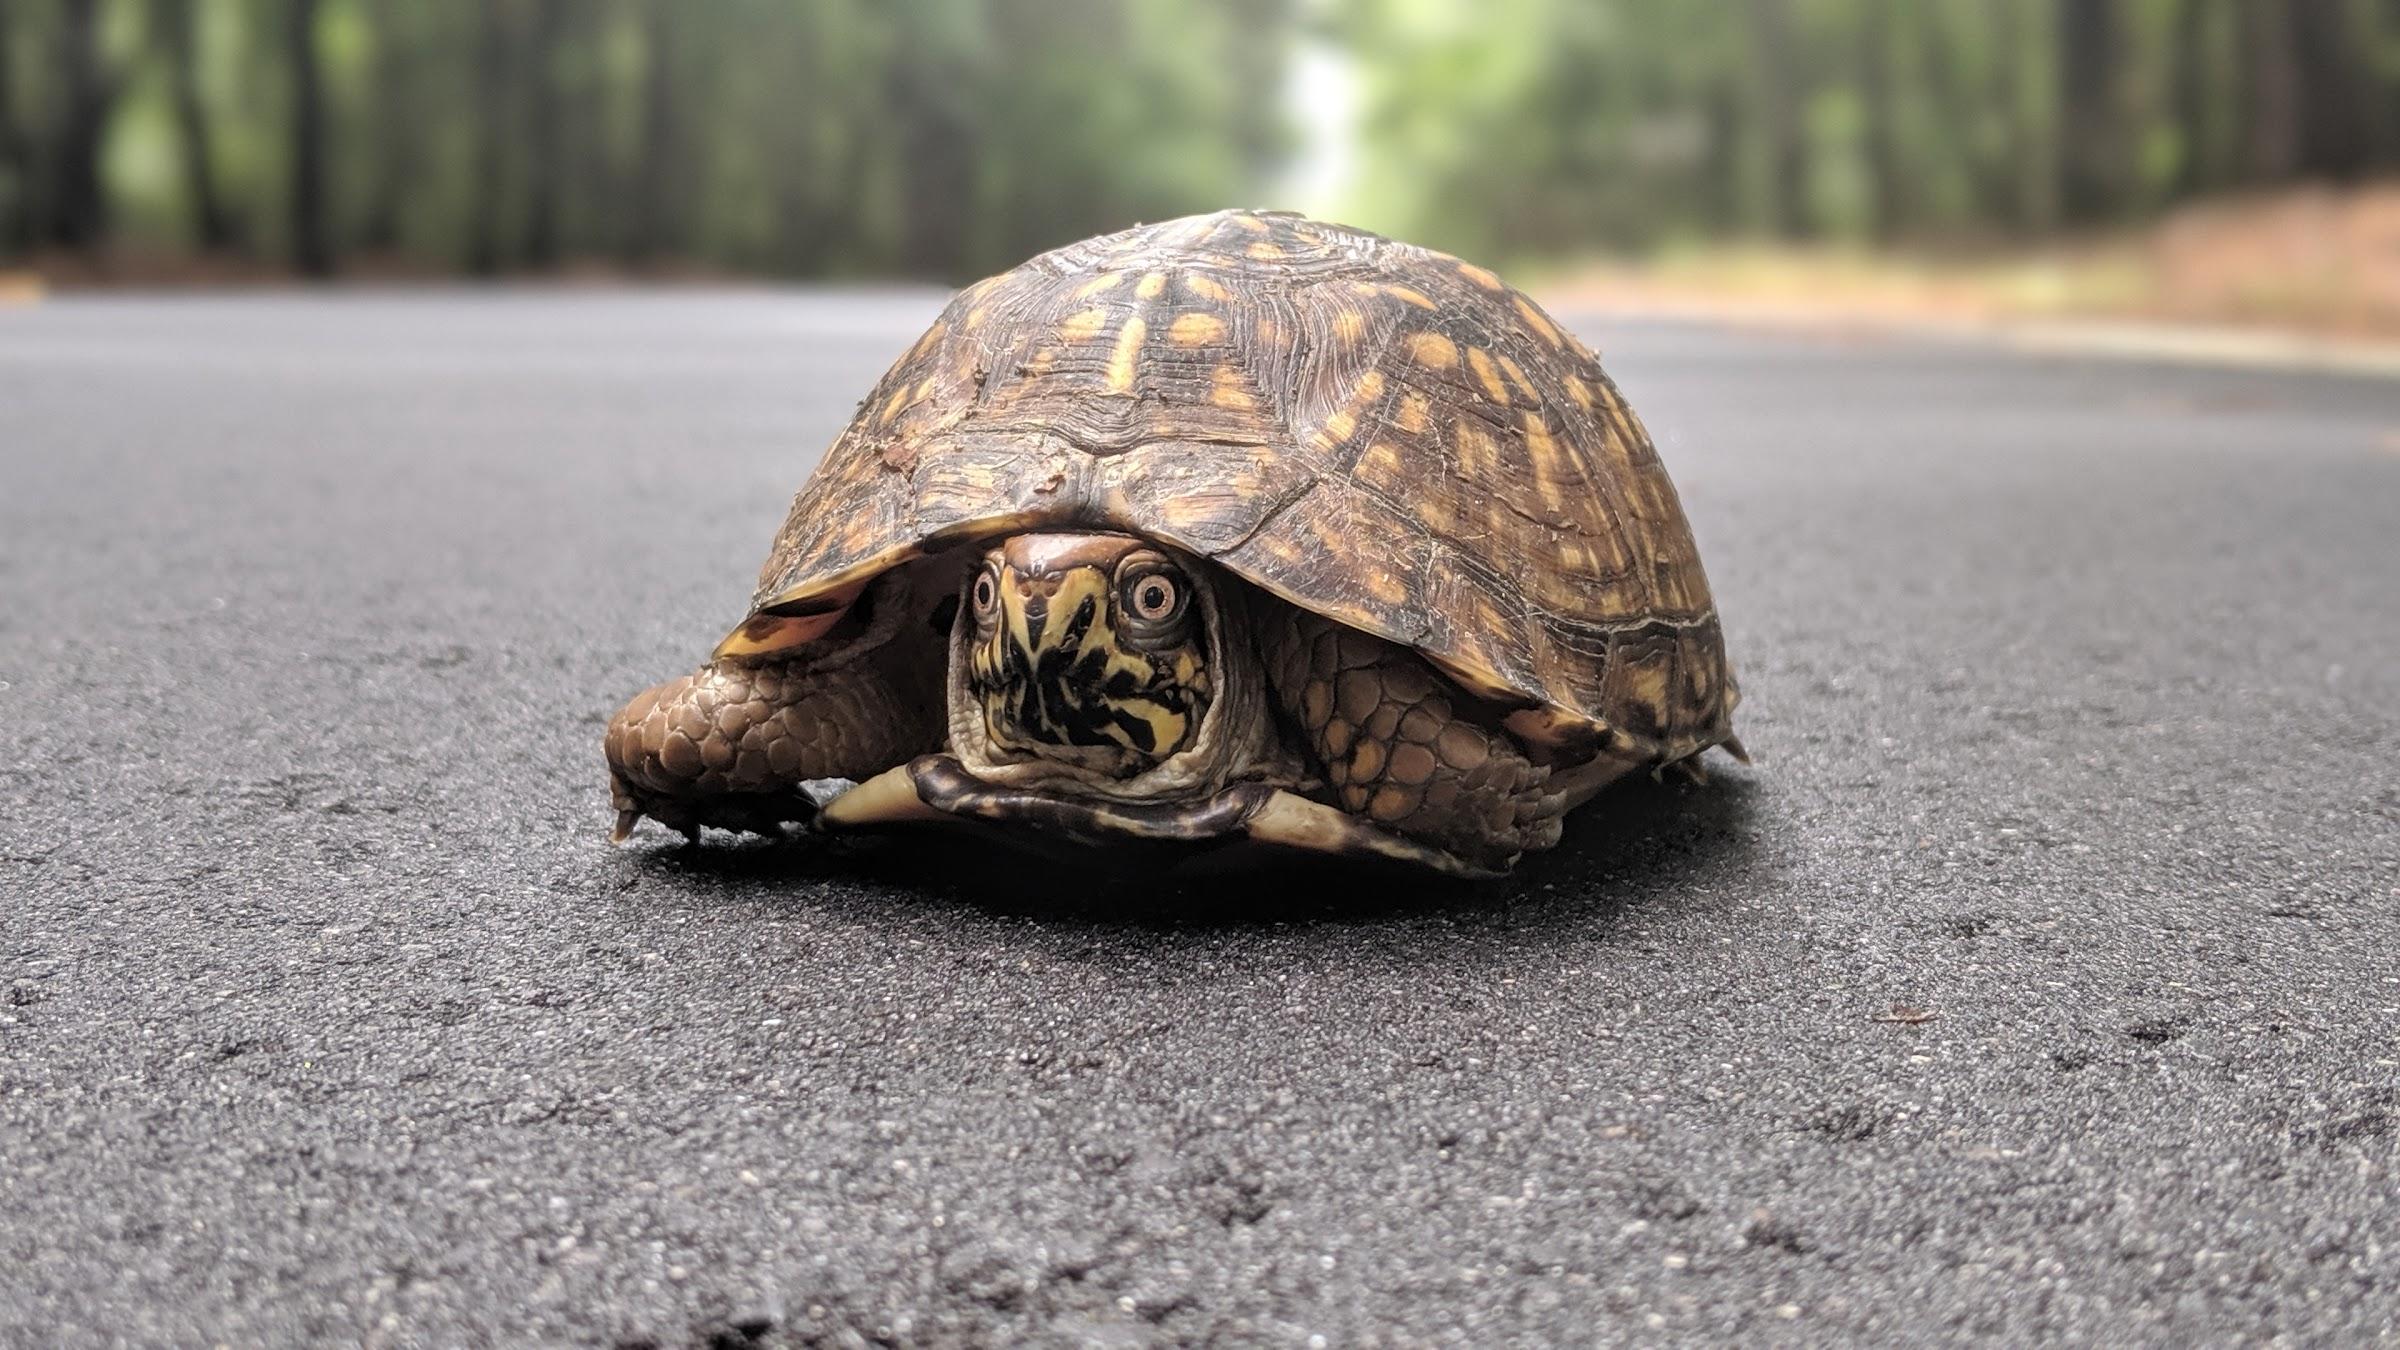 Turtle on Dr Evans Rd